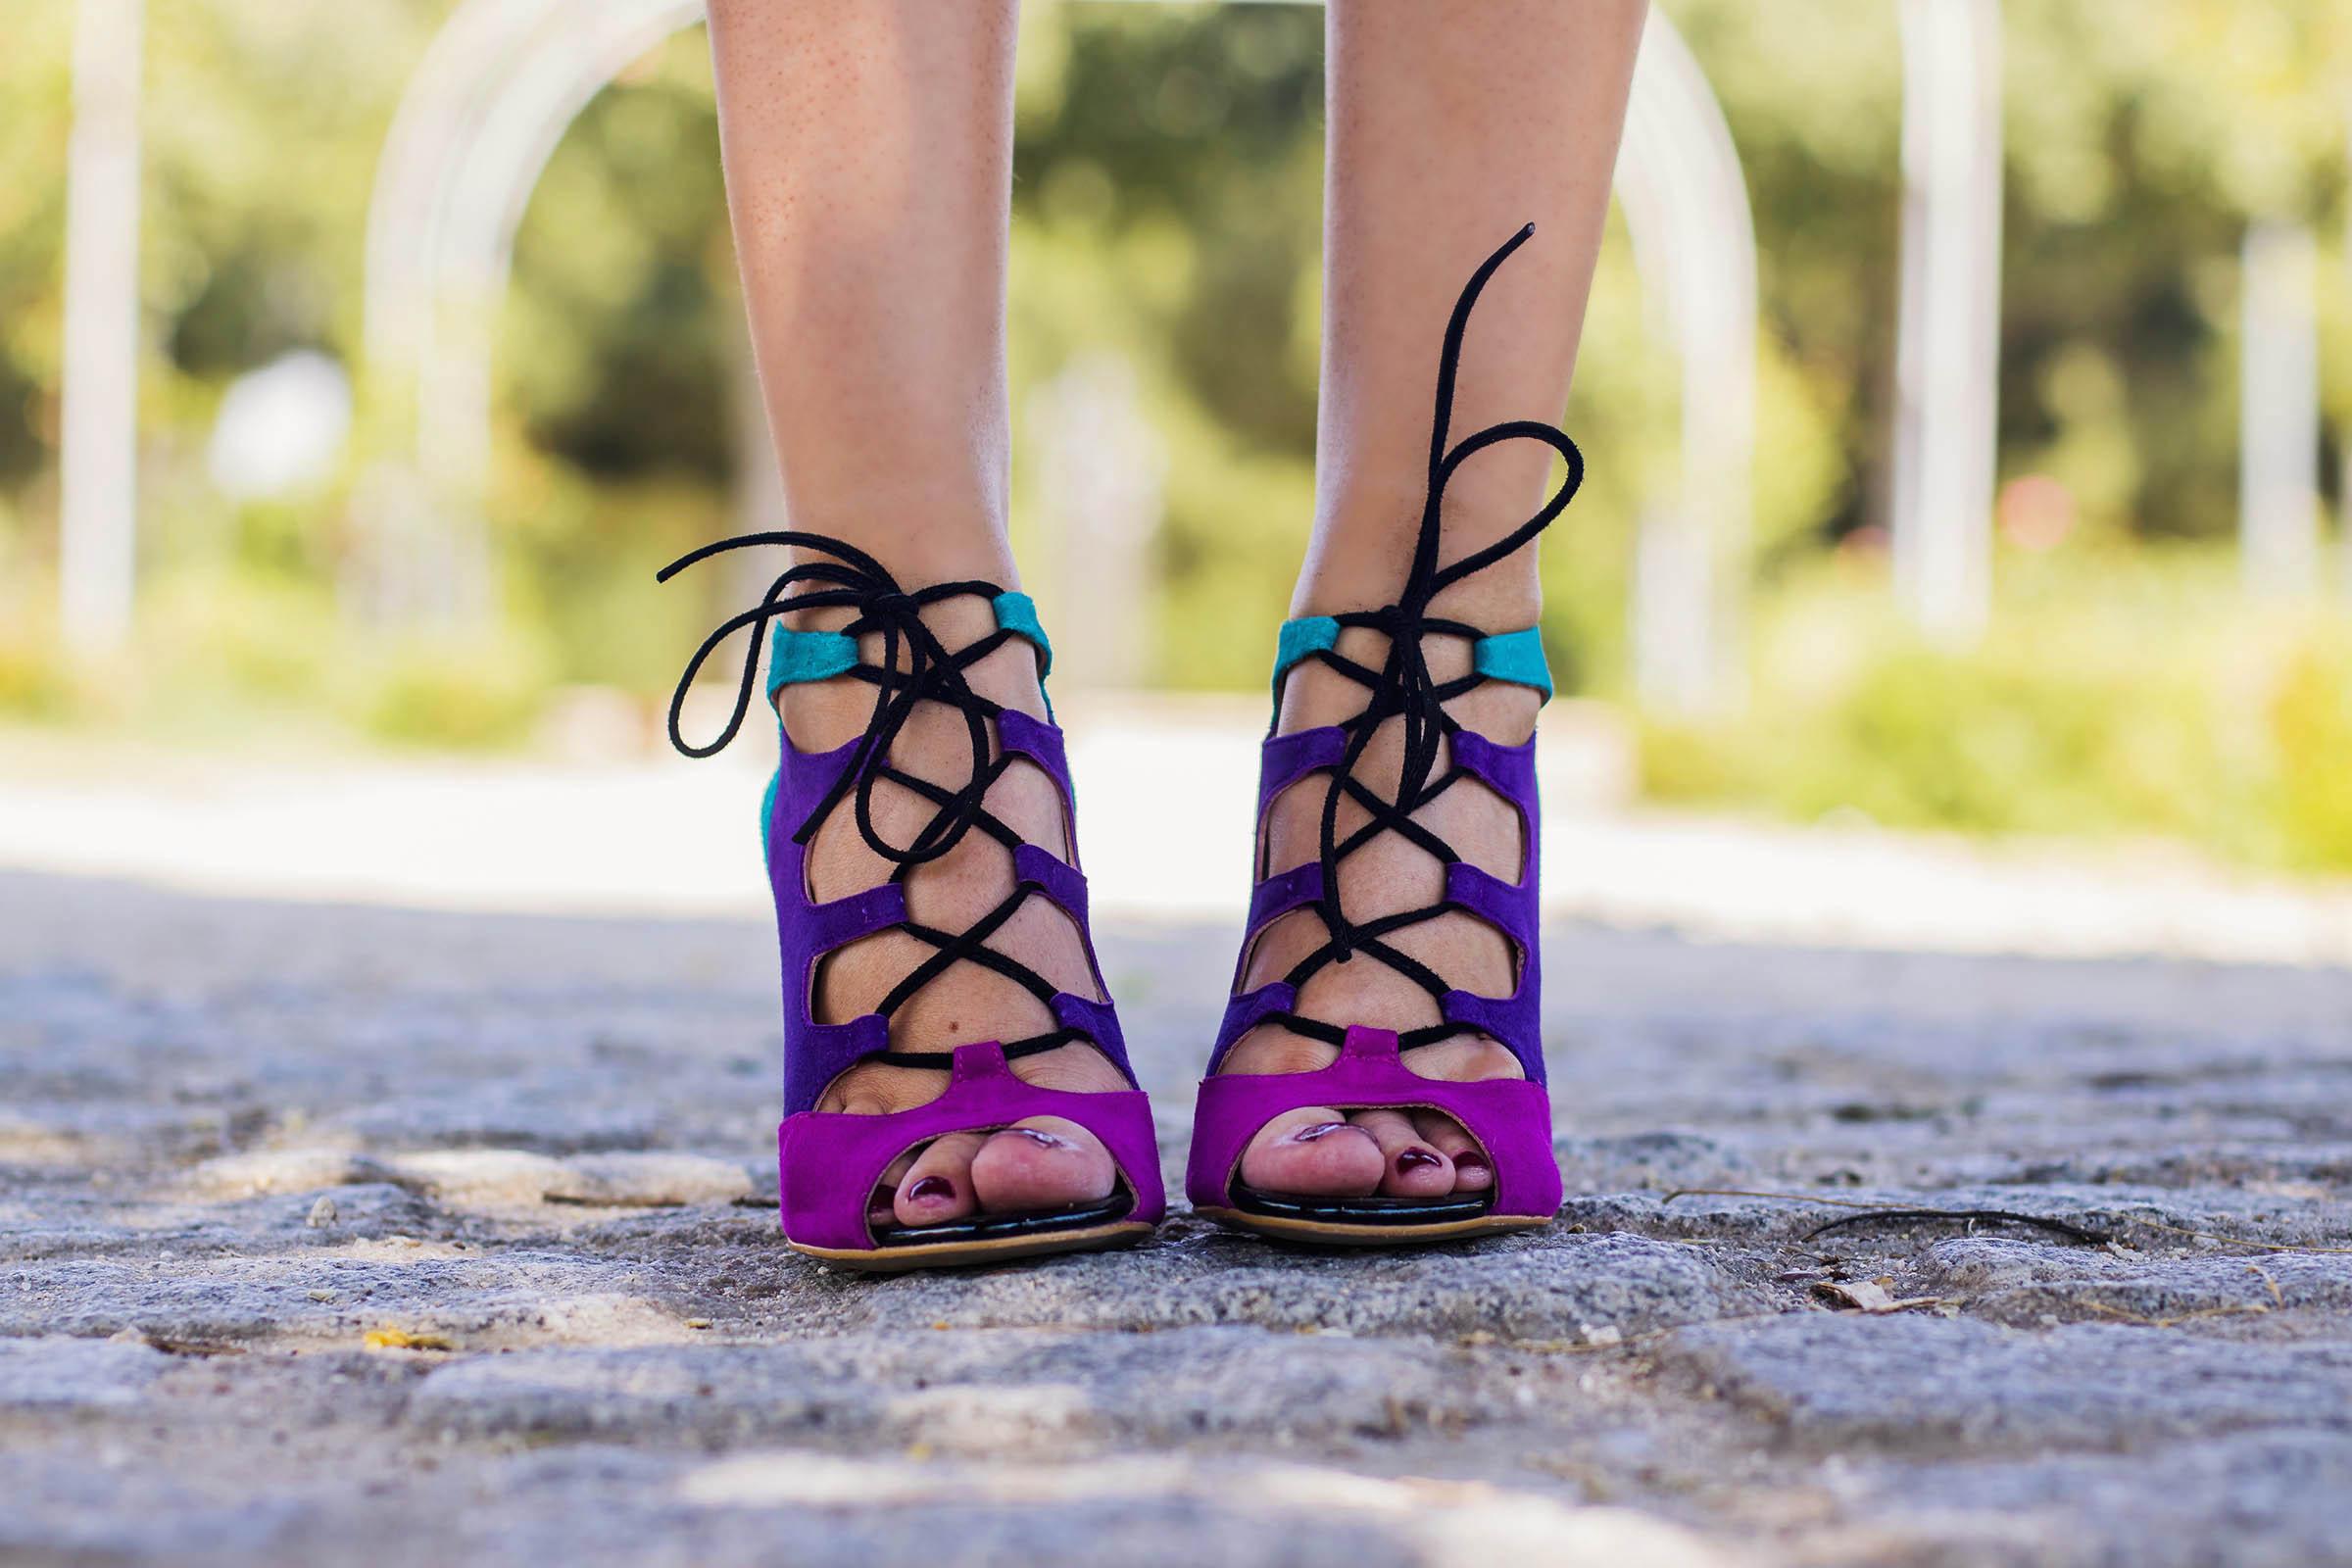 Sandalias zapatos fucsias invitada boda